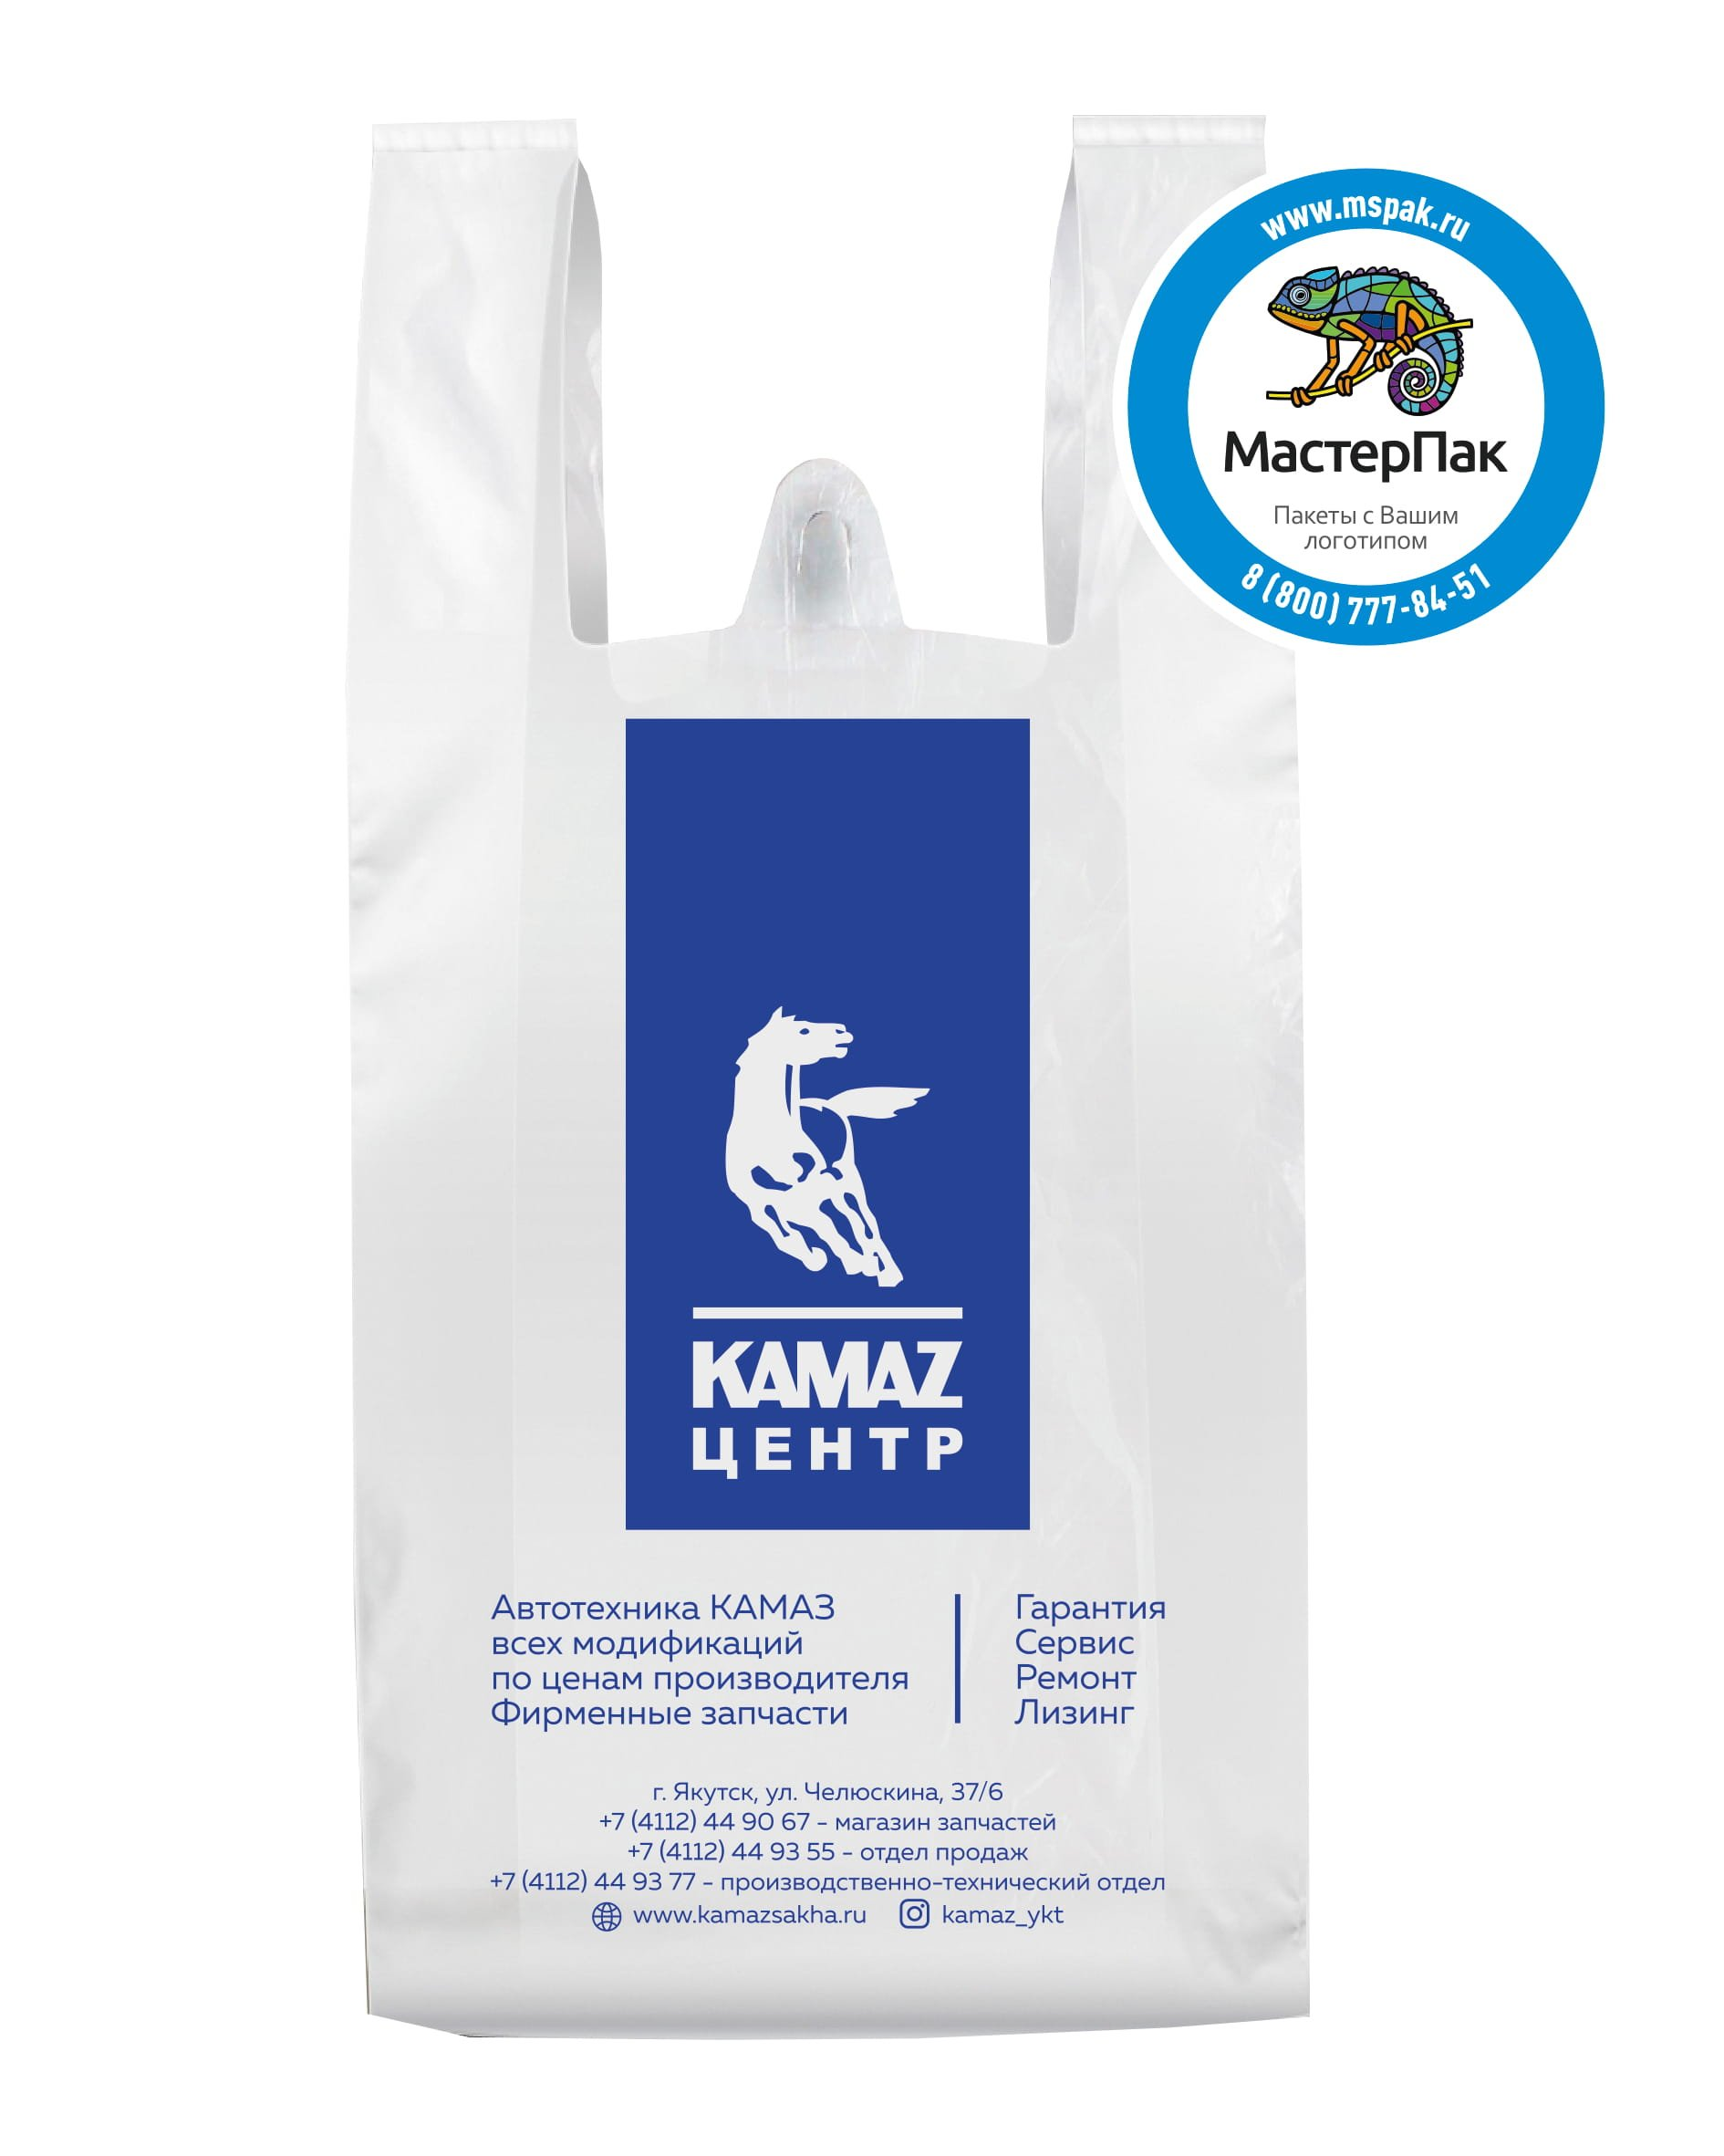 Пакет-майка ПНД, белый, с логотипом Kamaz центр, 25 мкм, 40*60